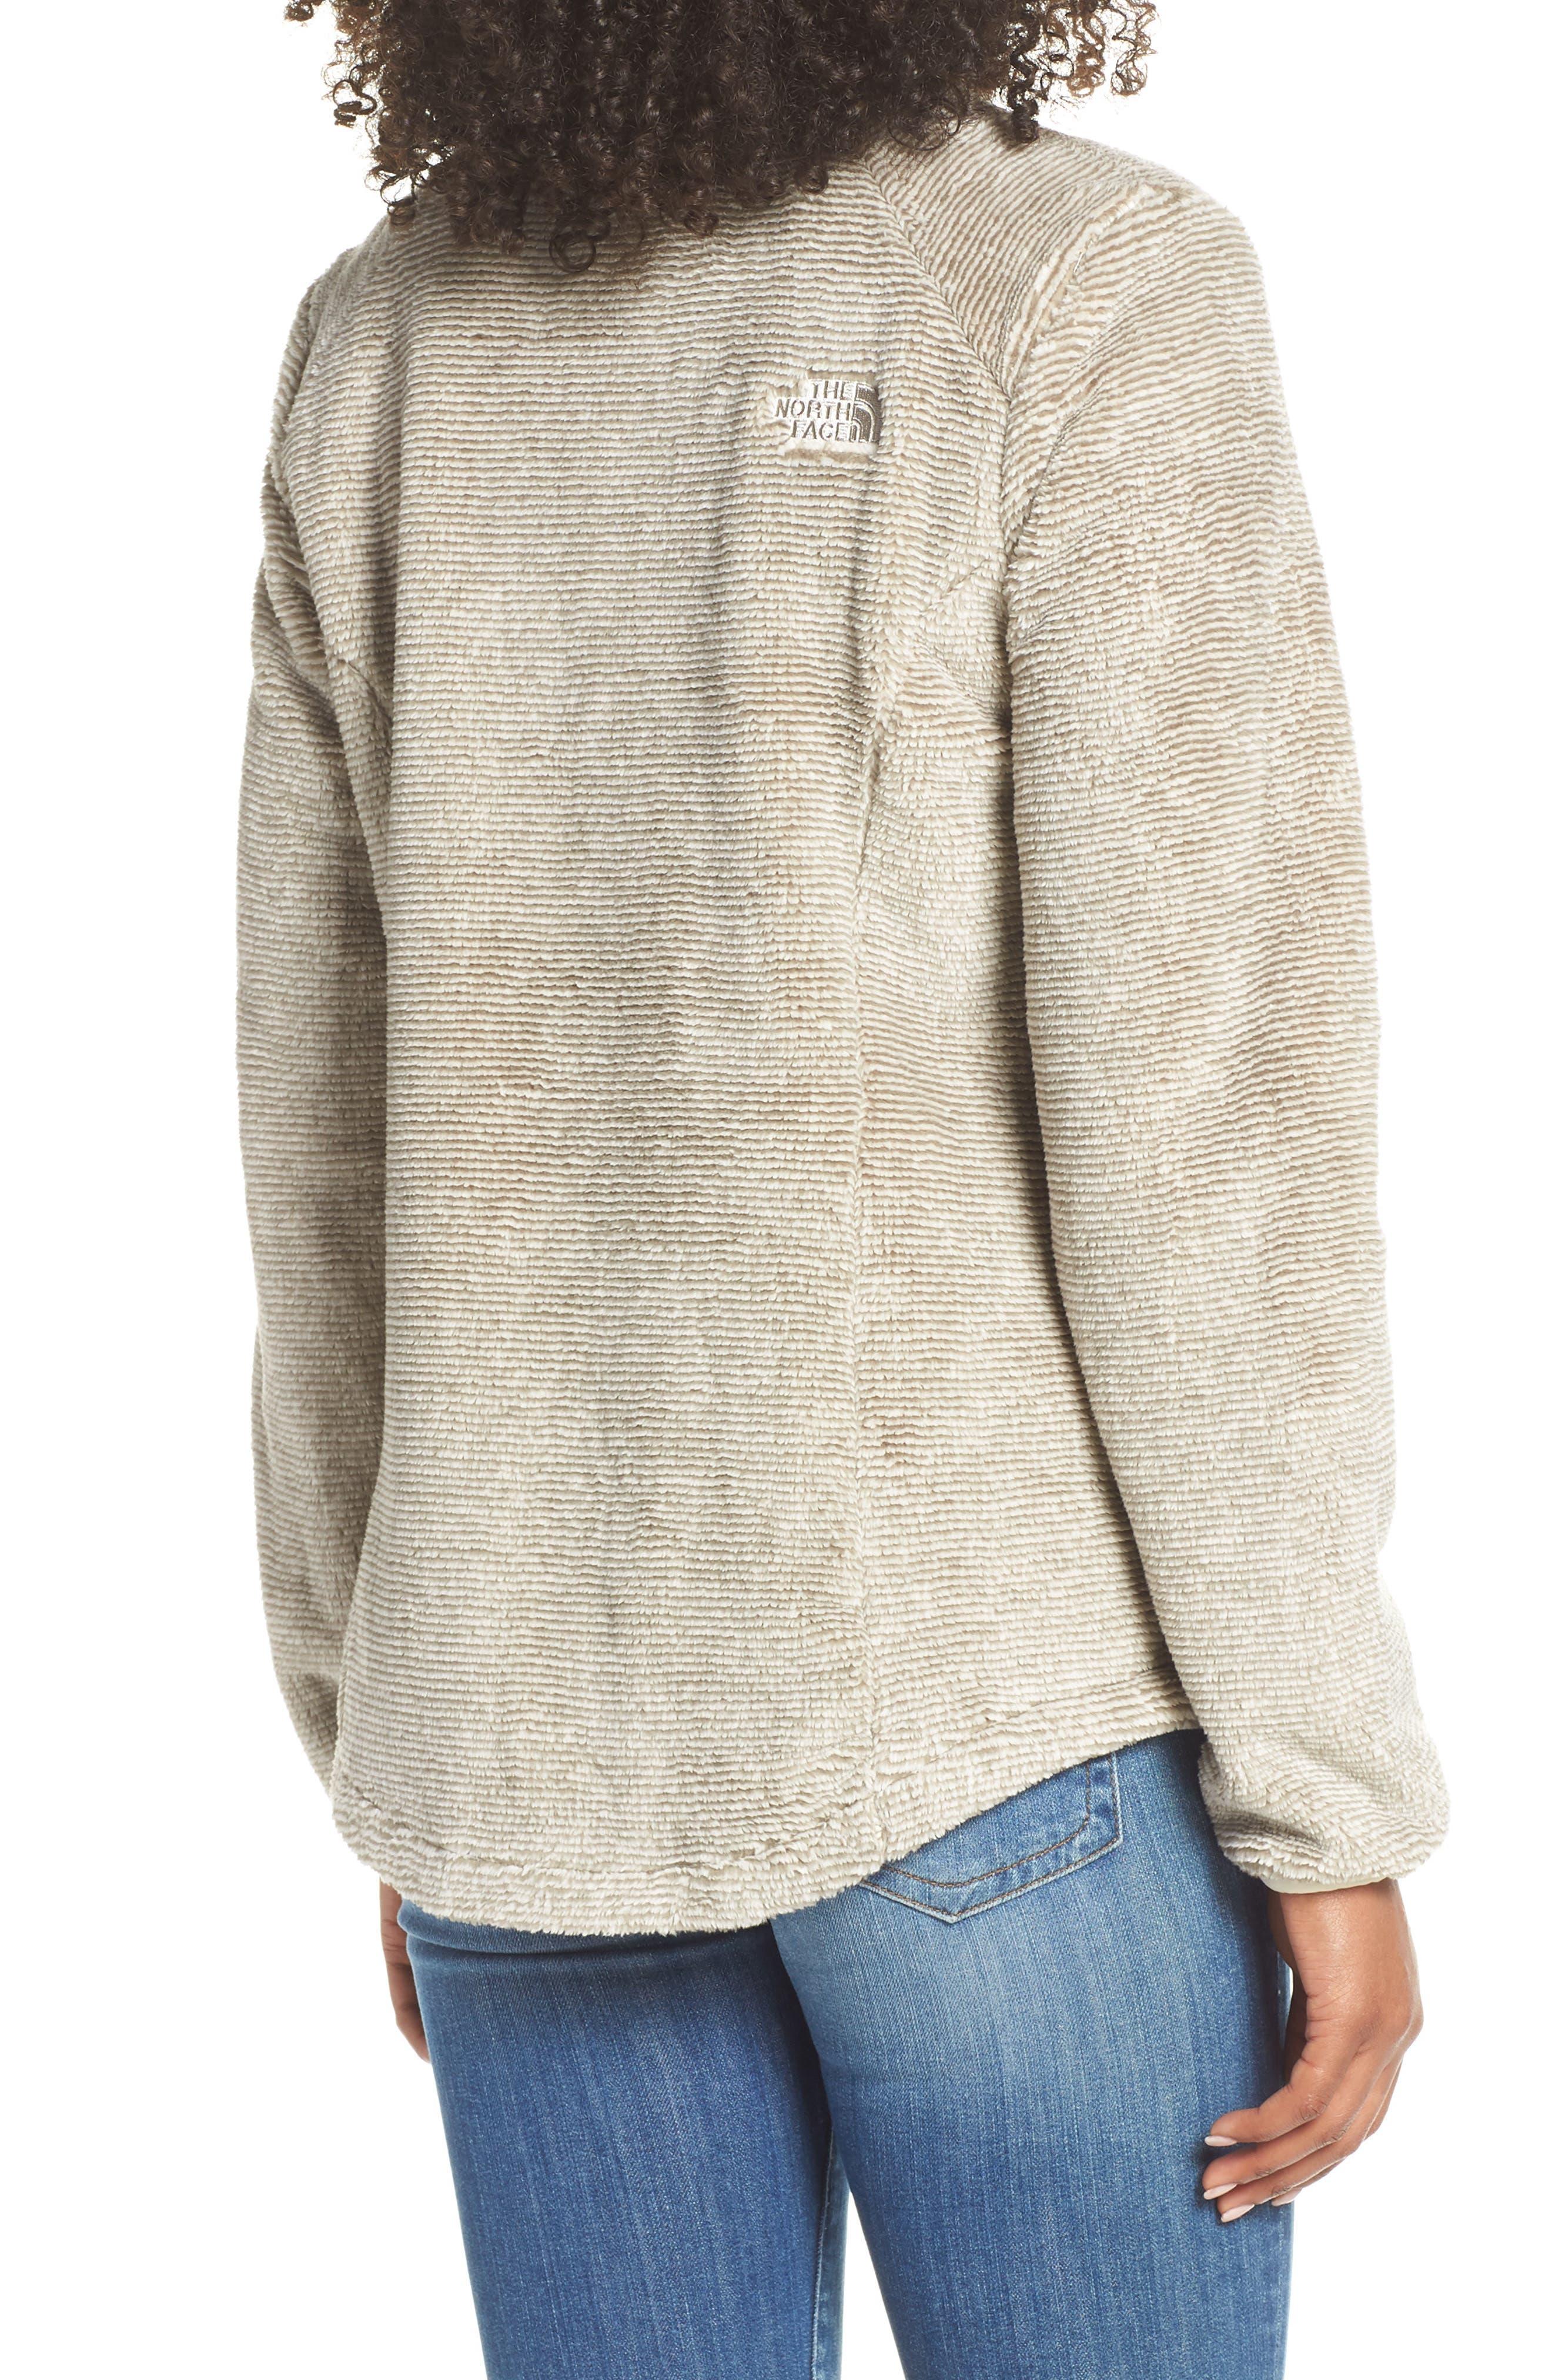 THE NORTH FACE, Osito 2 Stripe Fleece Jacket, Alternate thumbnail 2, color, GREY/ VINTAGE WHITE STRIPE